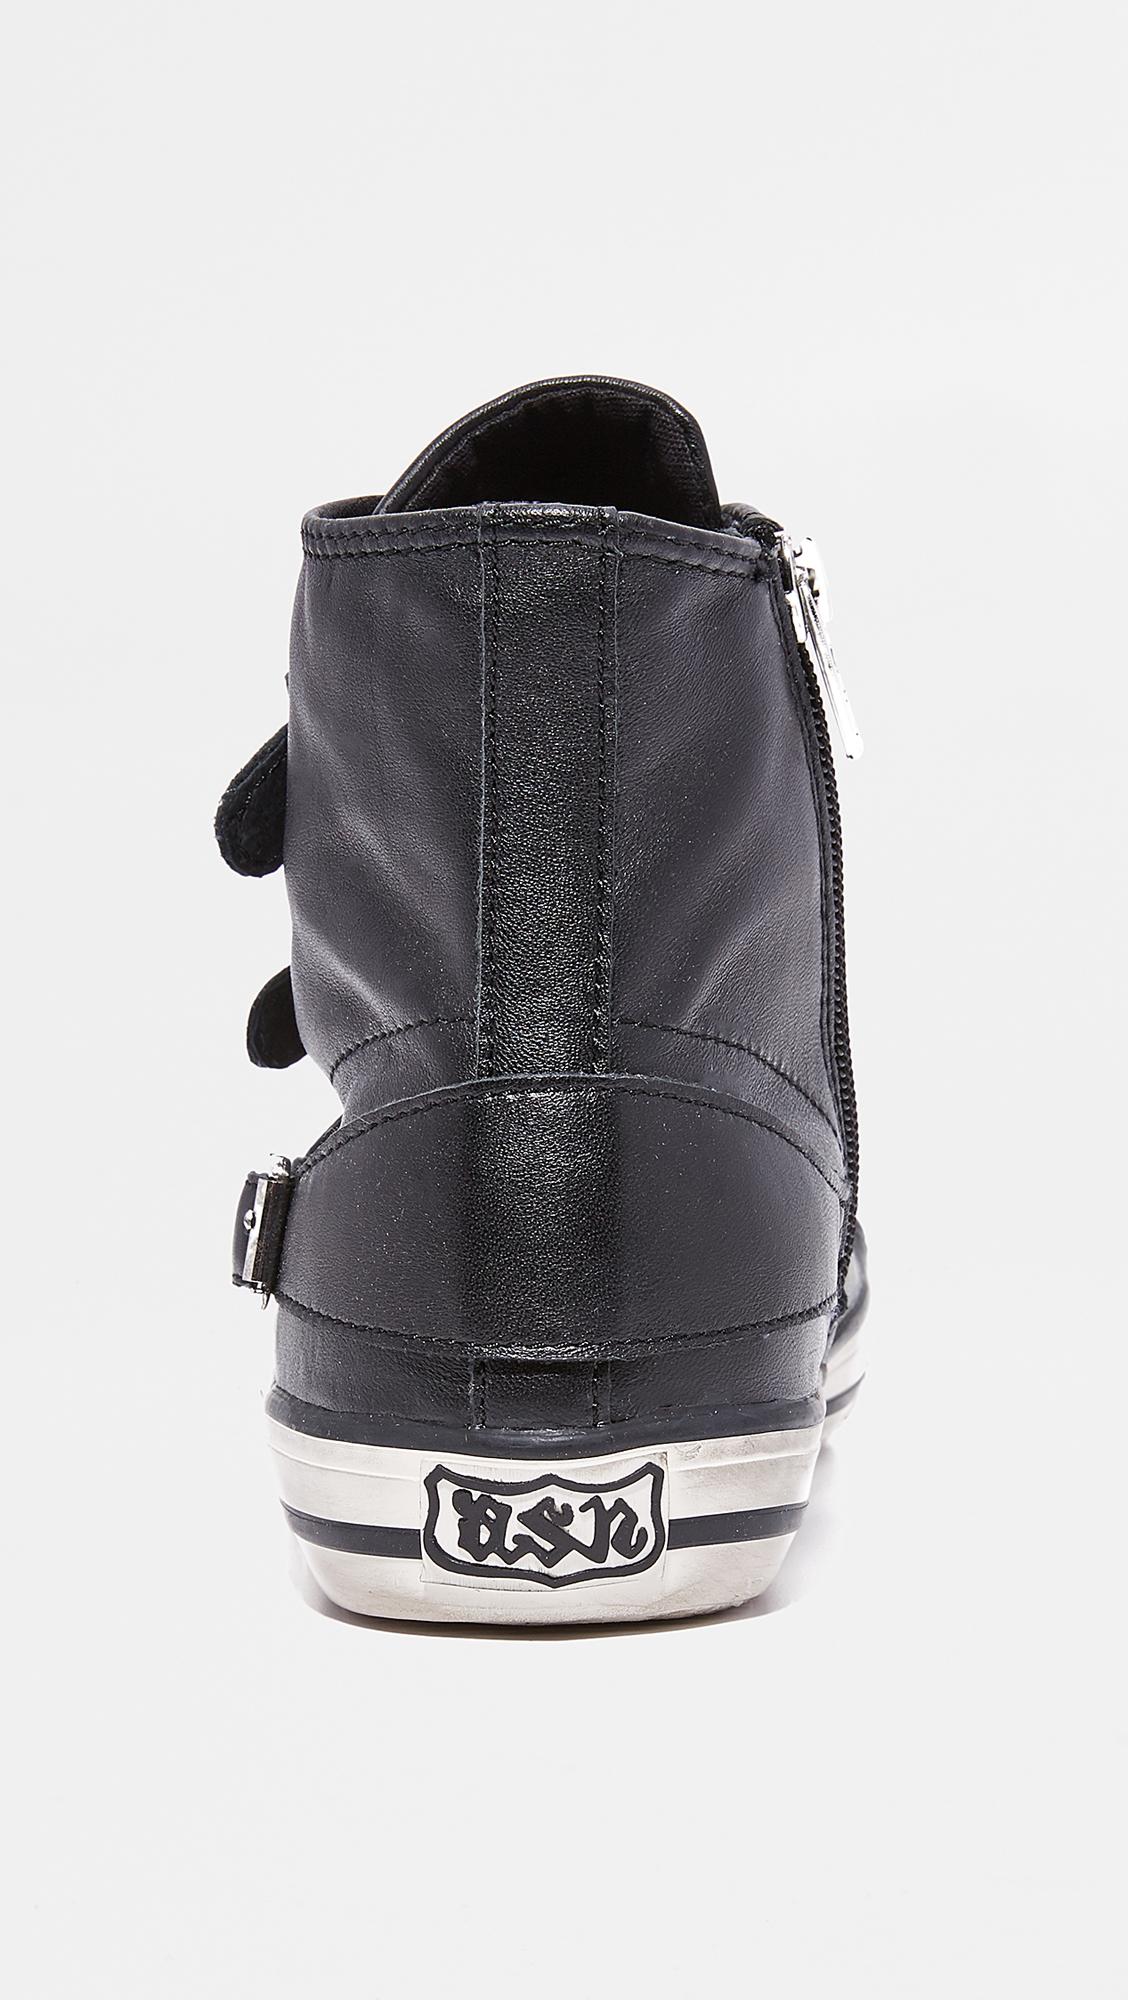 a280c9ac560e6 Ash Virgin Buckled High Top Sneakers